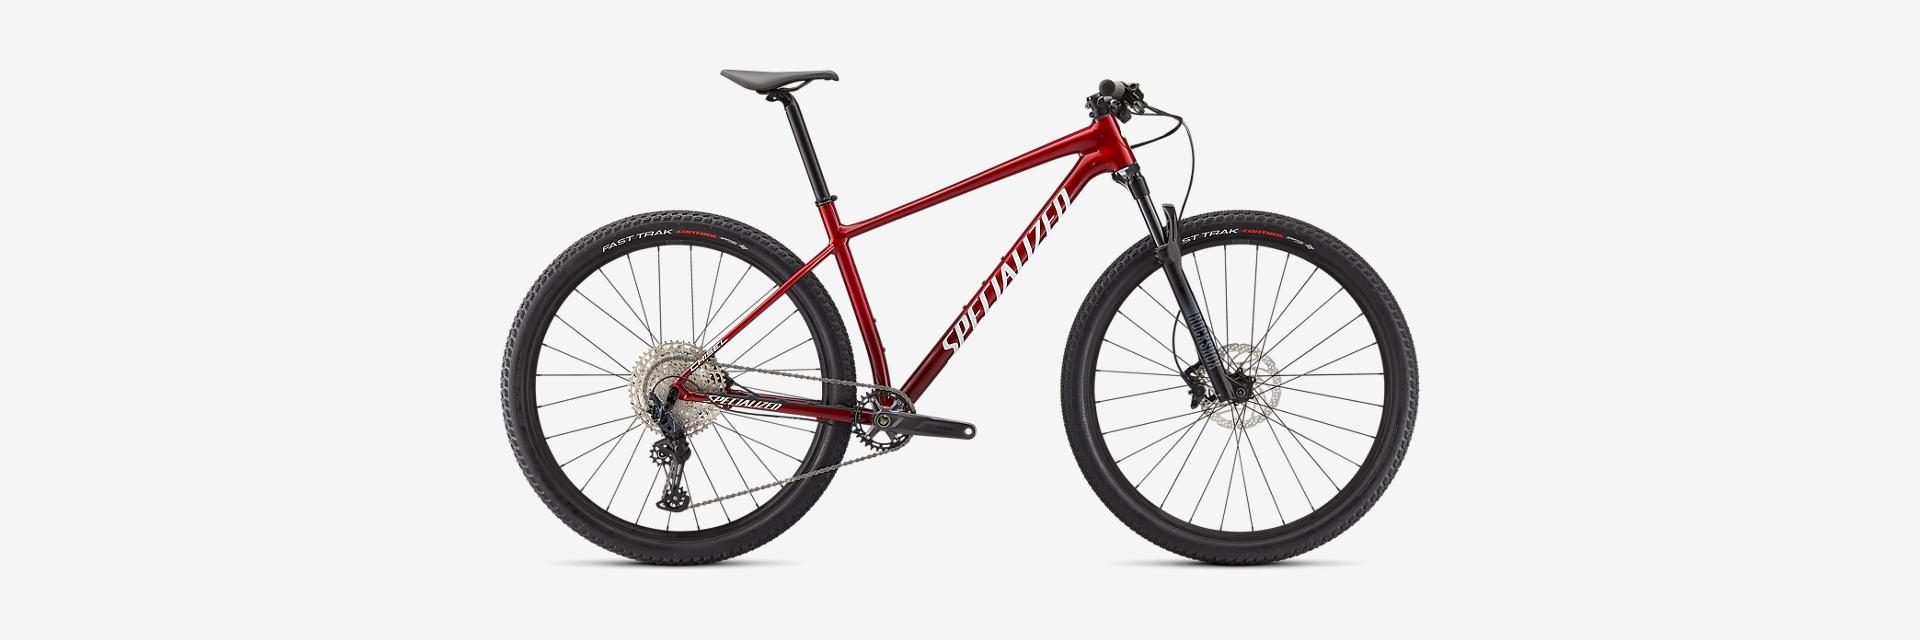 Bicicleta lançamento 2021, Specialized Chisel Comp